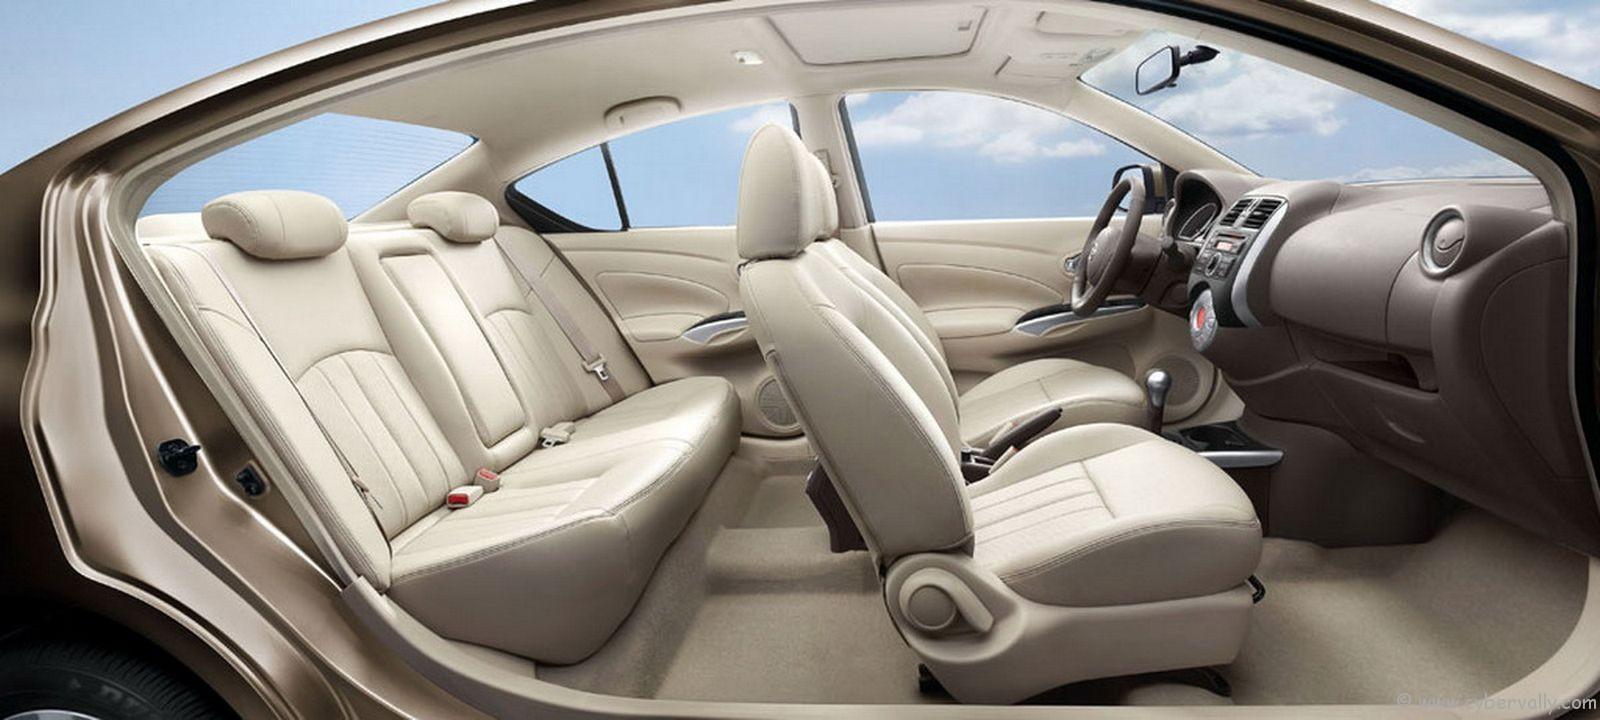 New Nissan Sunny Sedan Unveiled